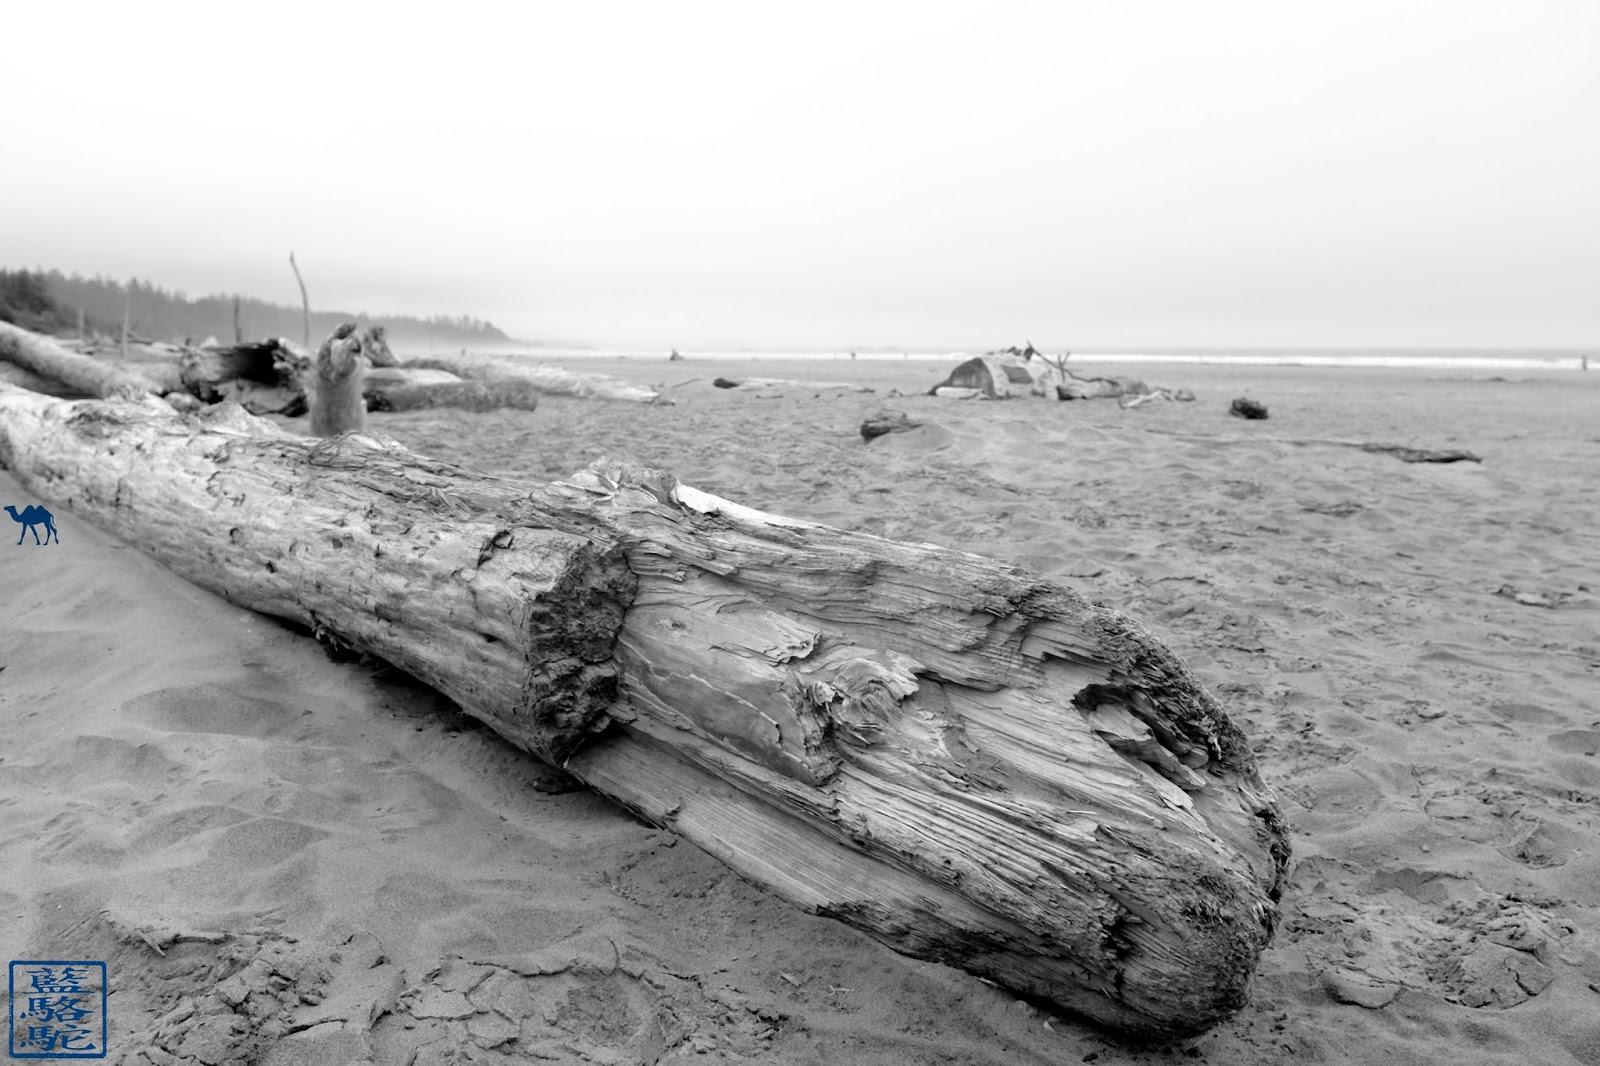 Le Chameau Bleu - Long Beach Tofino